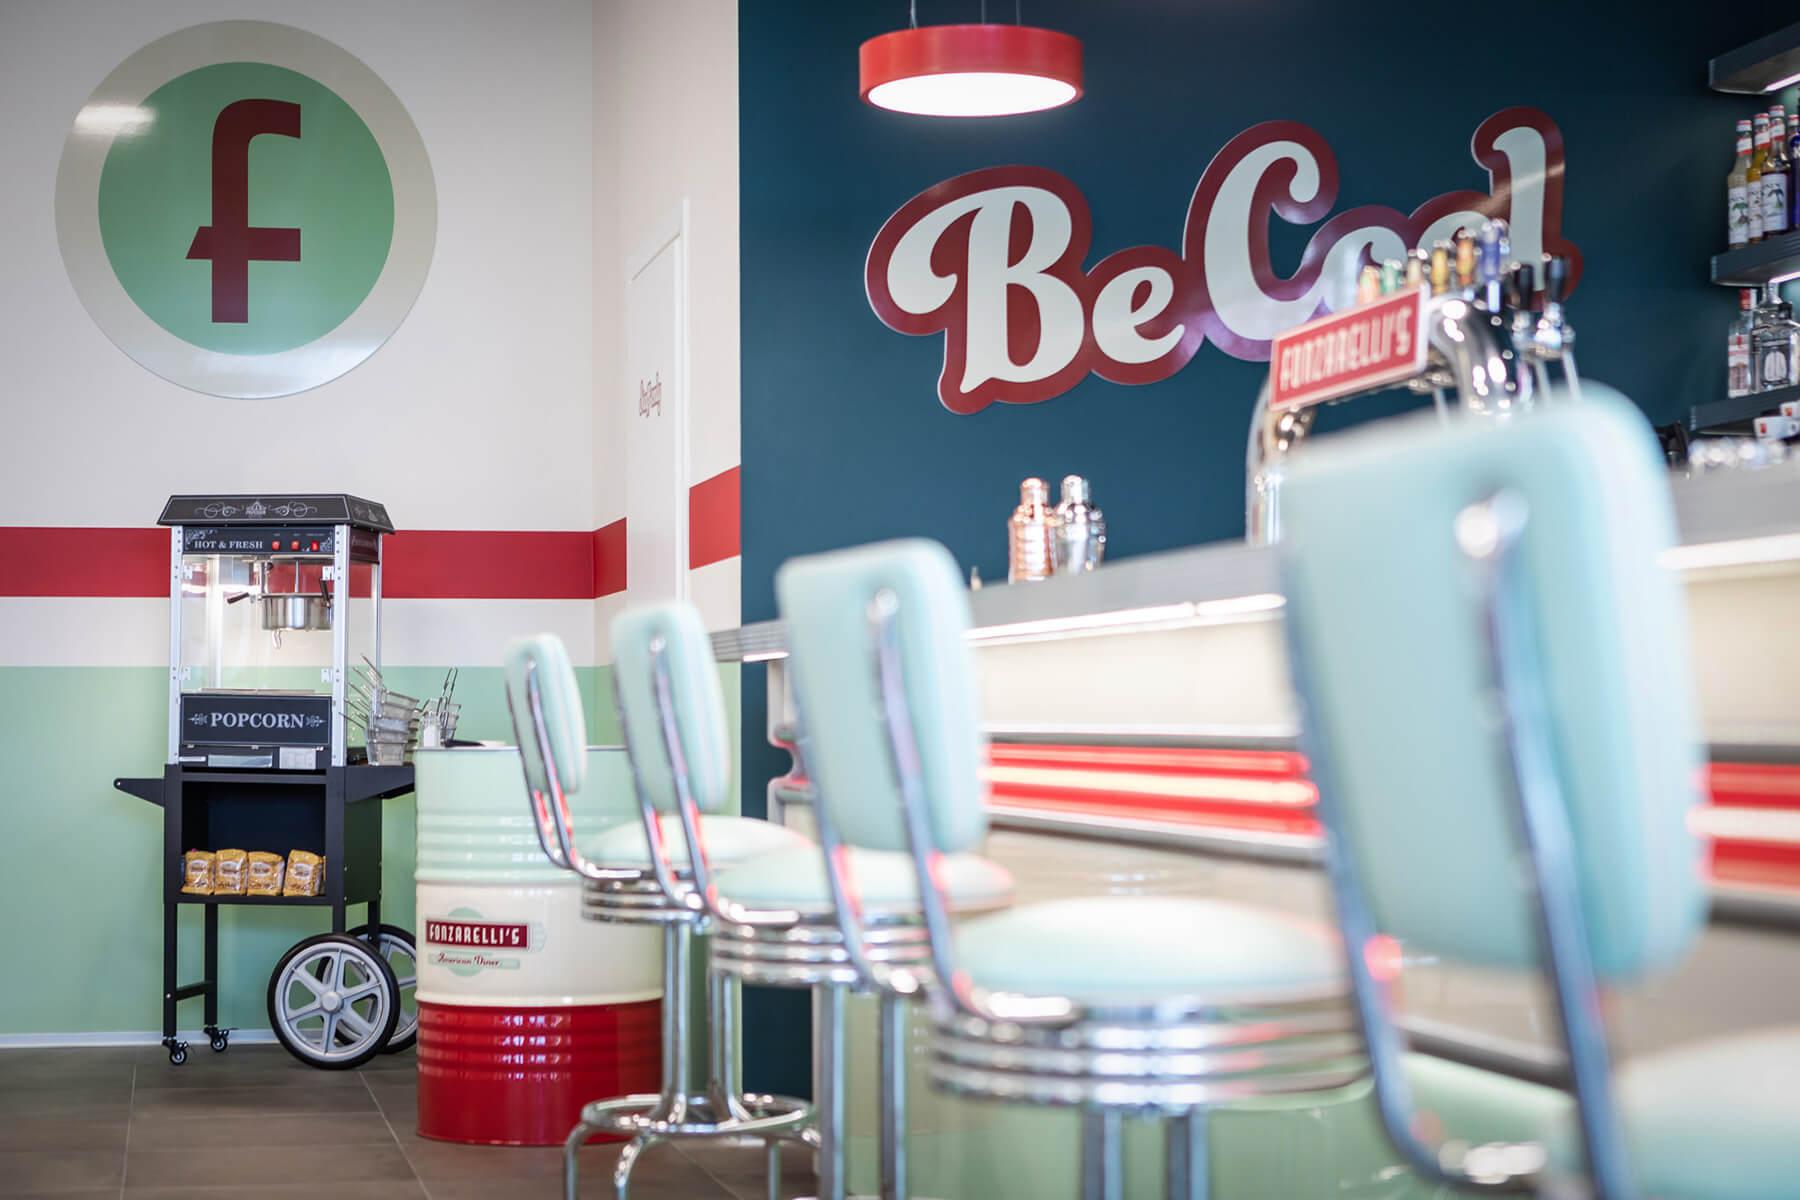 Macchina da pop corn e bar in stile anni '50